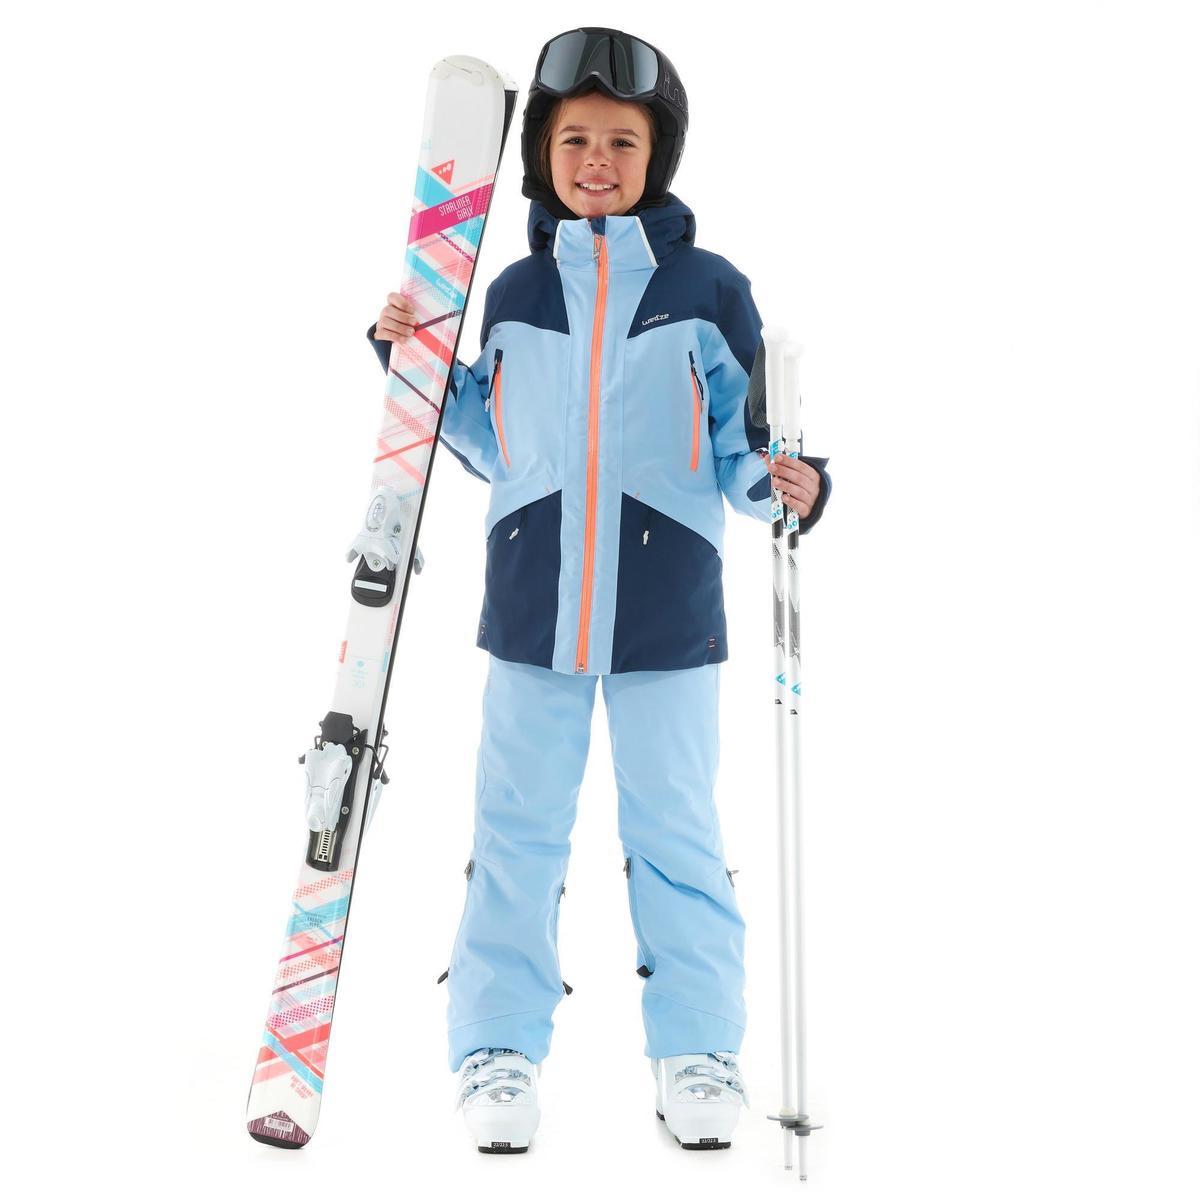 Bild 2 von Skijacke Piste 900 Kinder blau